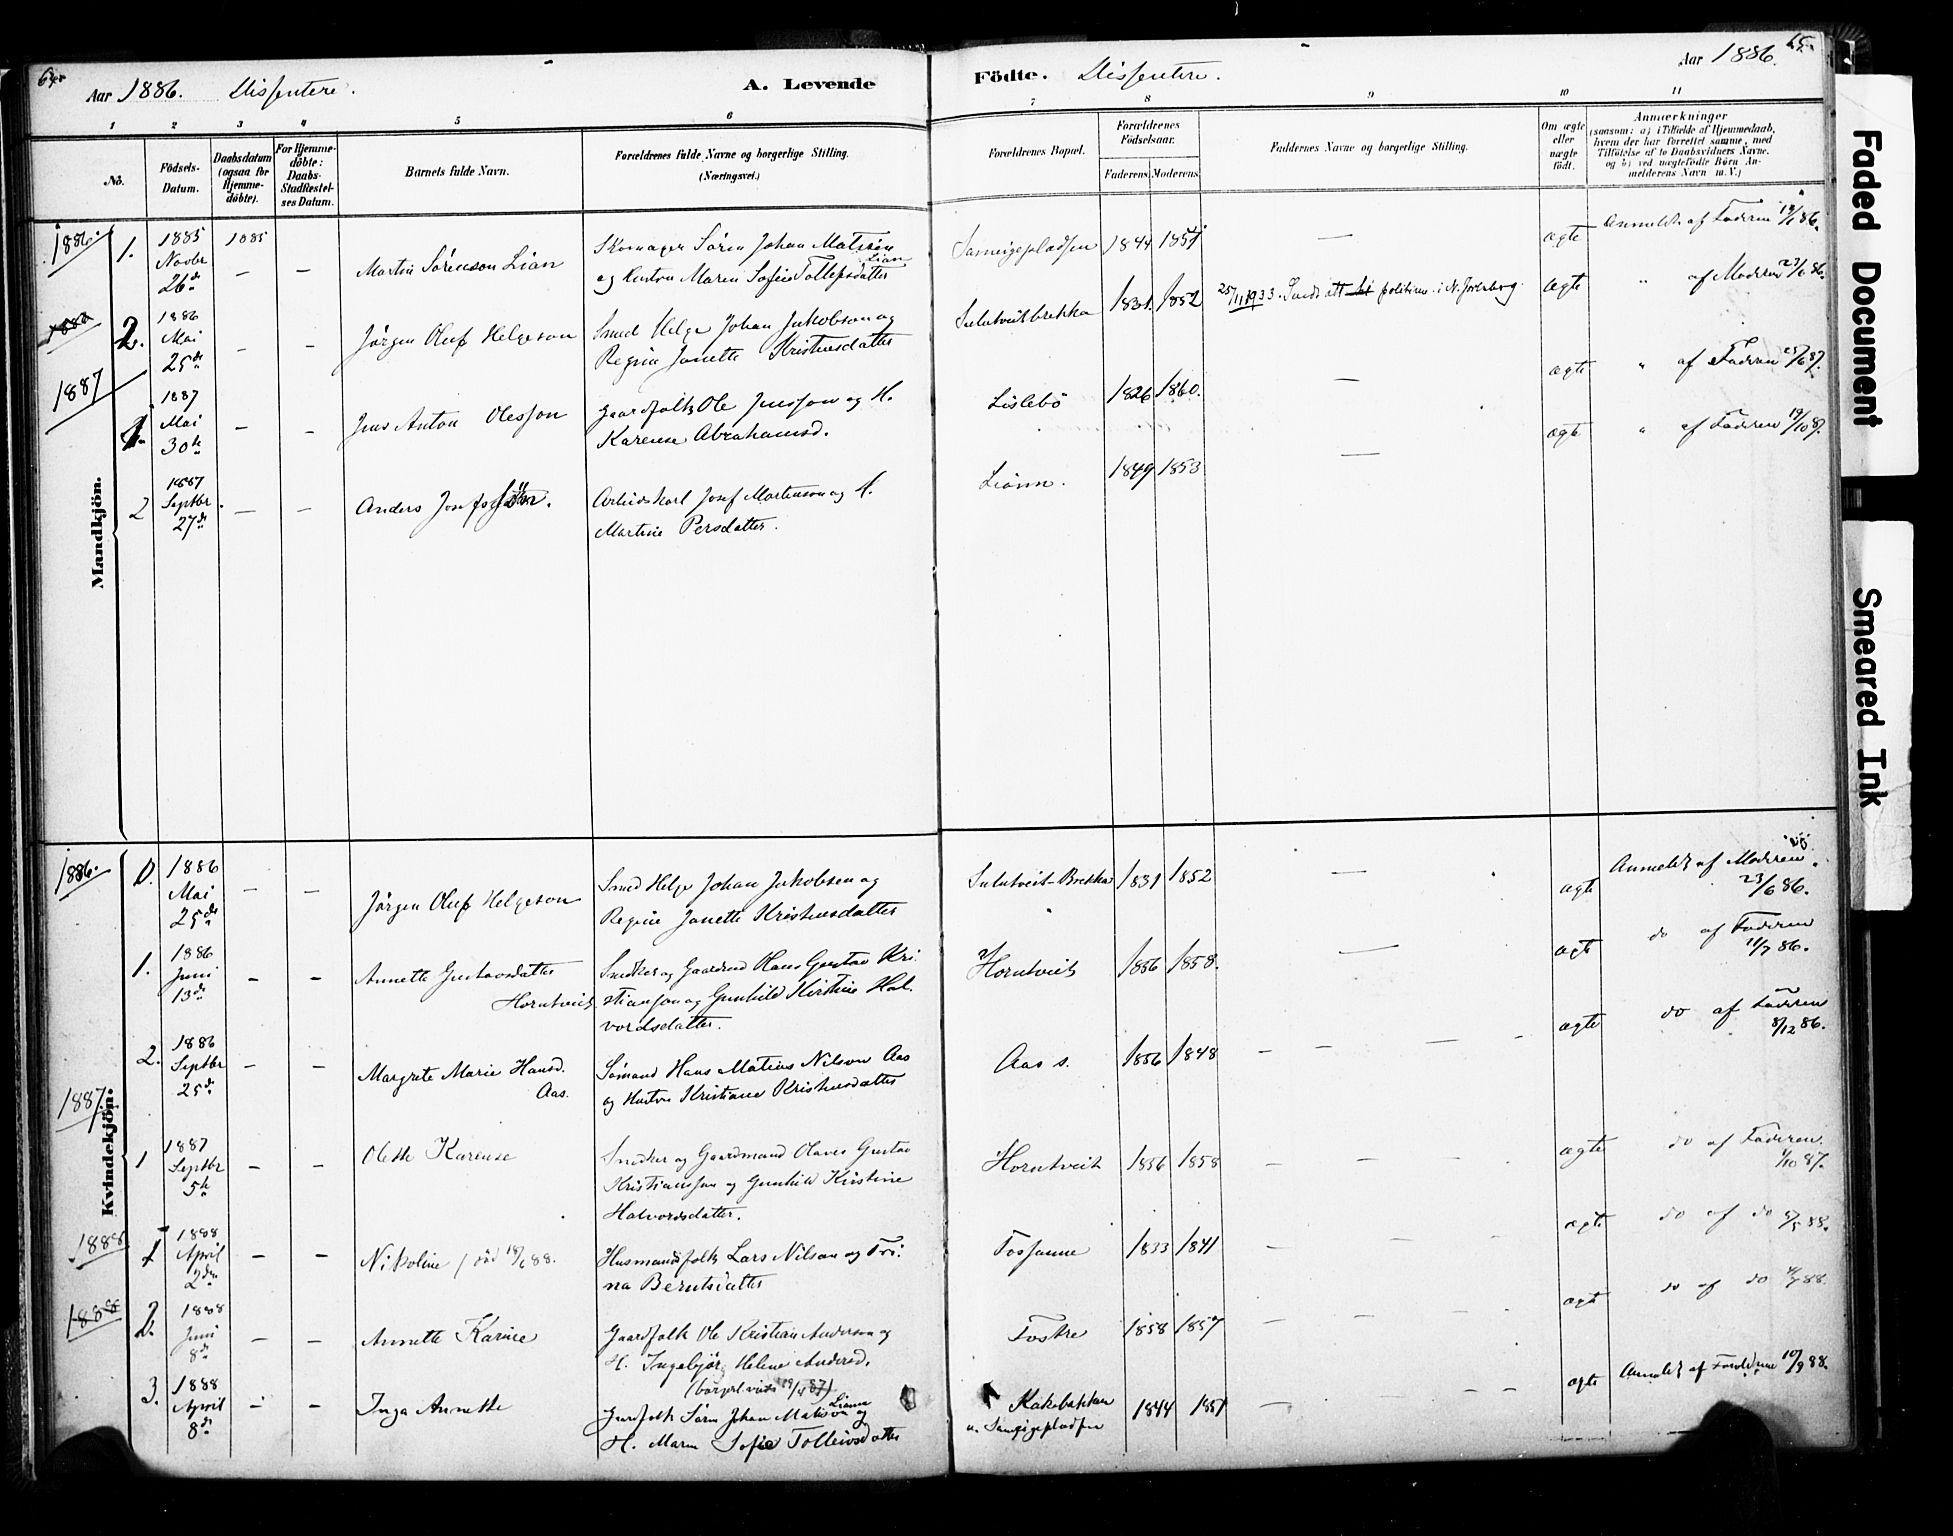 SAKO, Ramnes kirkebøker, F/Fb/L0001: Ministerialbok nr. II 1, 1878-1894, s. 64-65